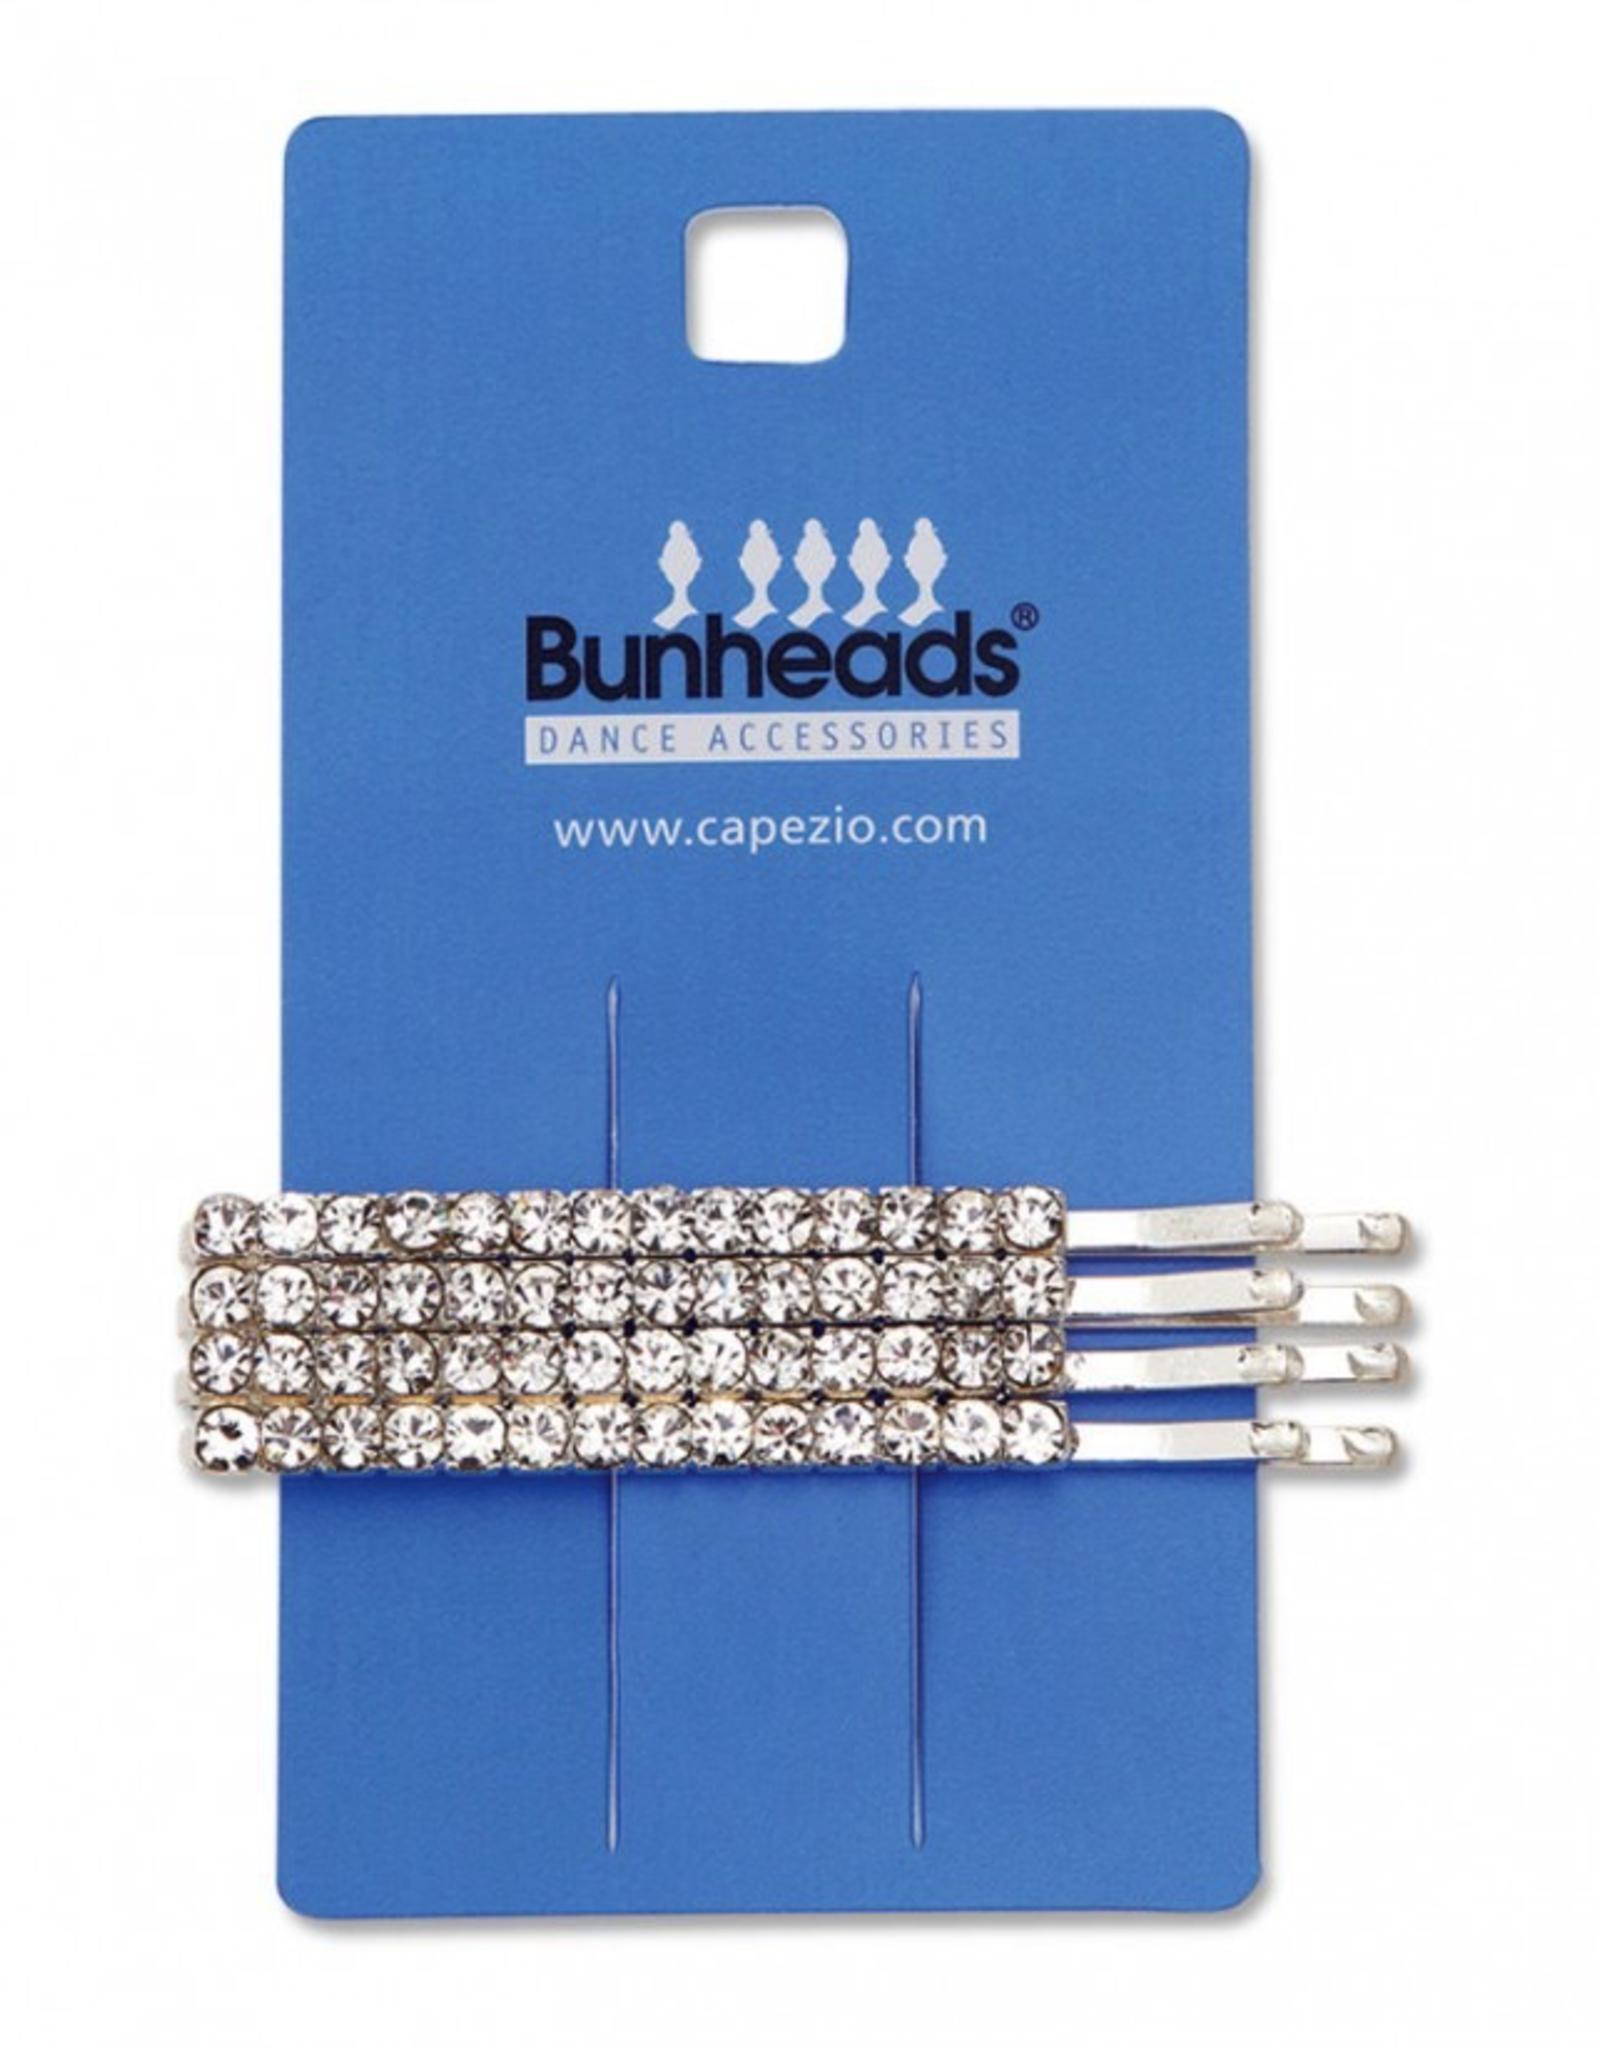 Capezio Sparkle Bobby Pins